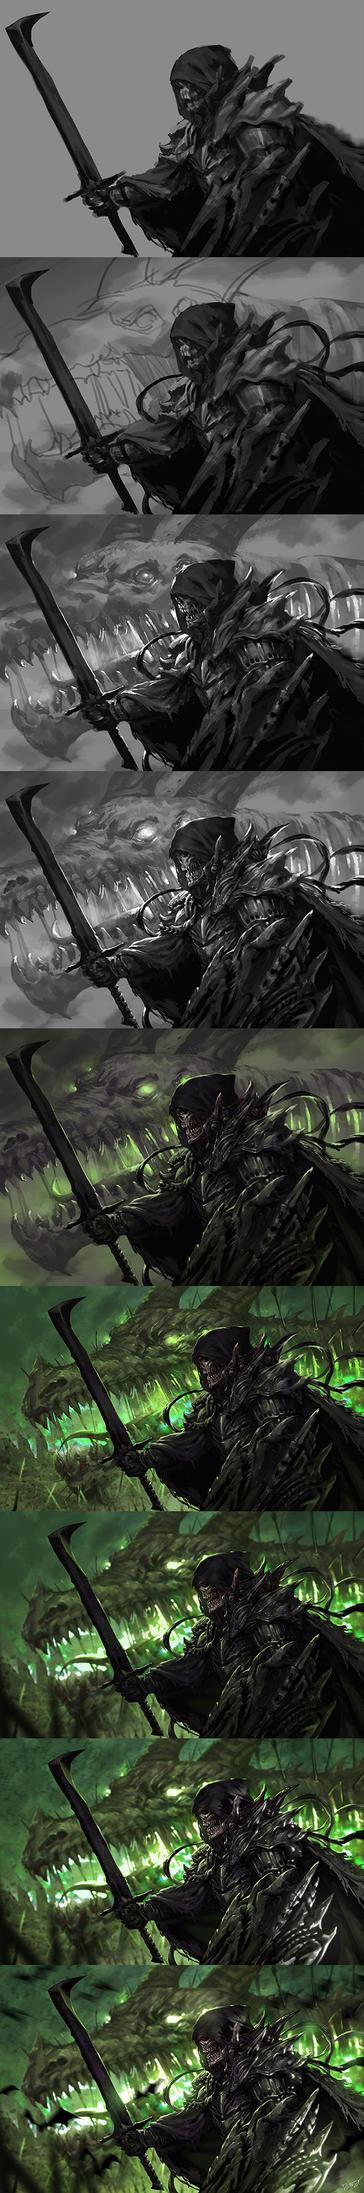 Undead Knight Work Process by dcwj